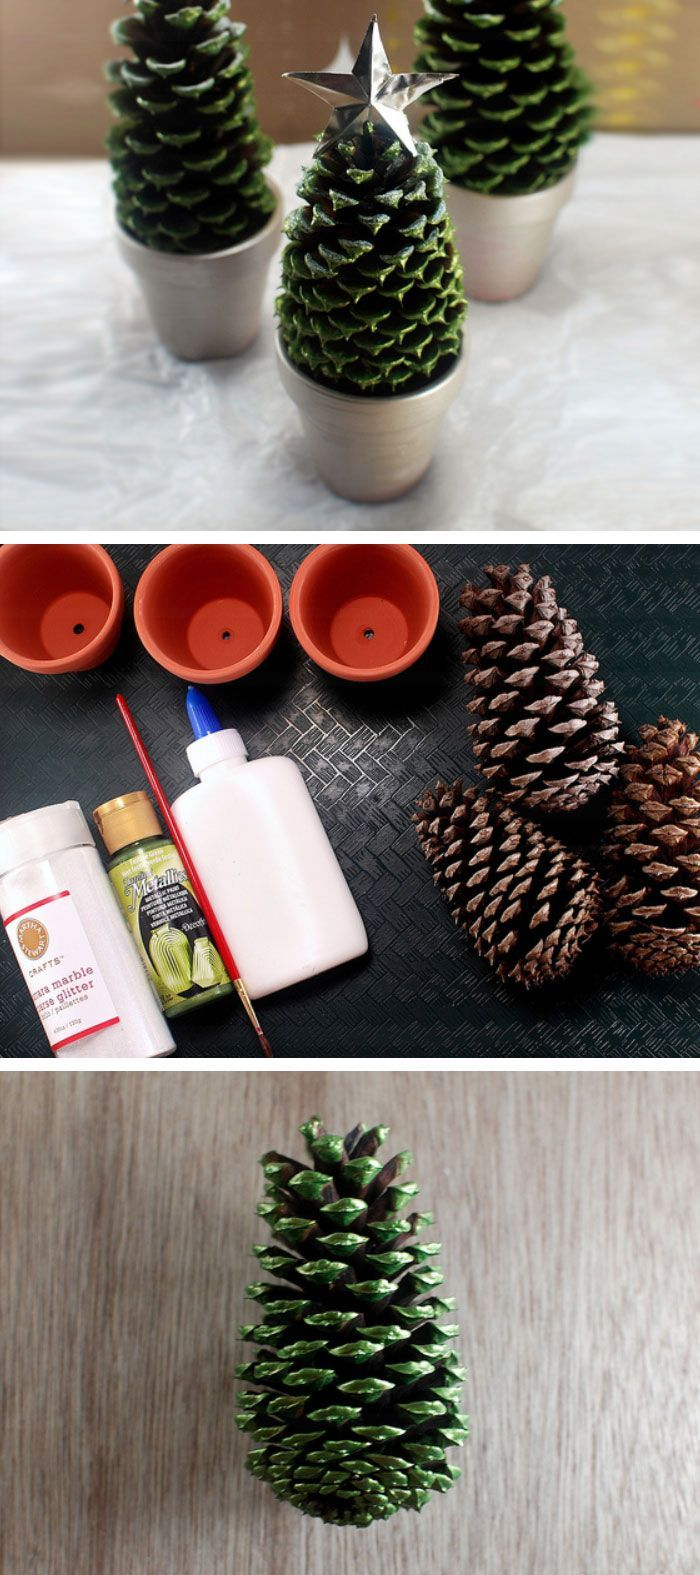 22 Most Amazing Cranberry Christmas Decor Ideas images